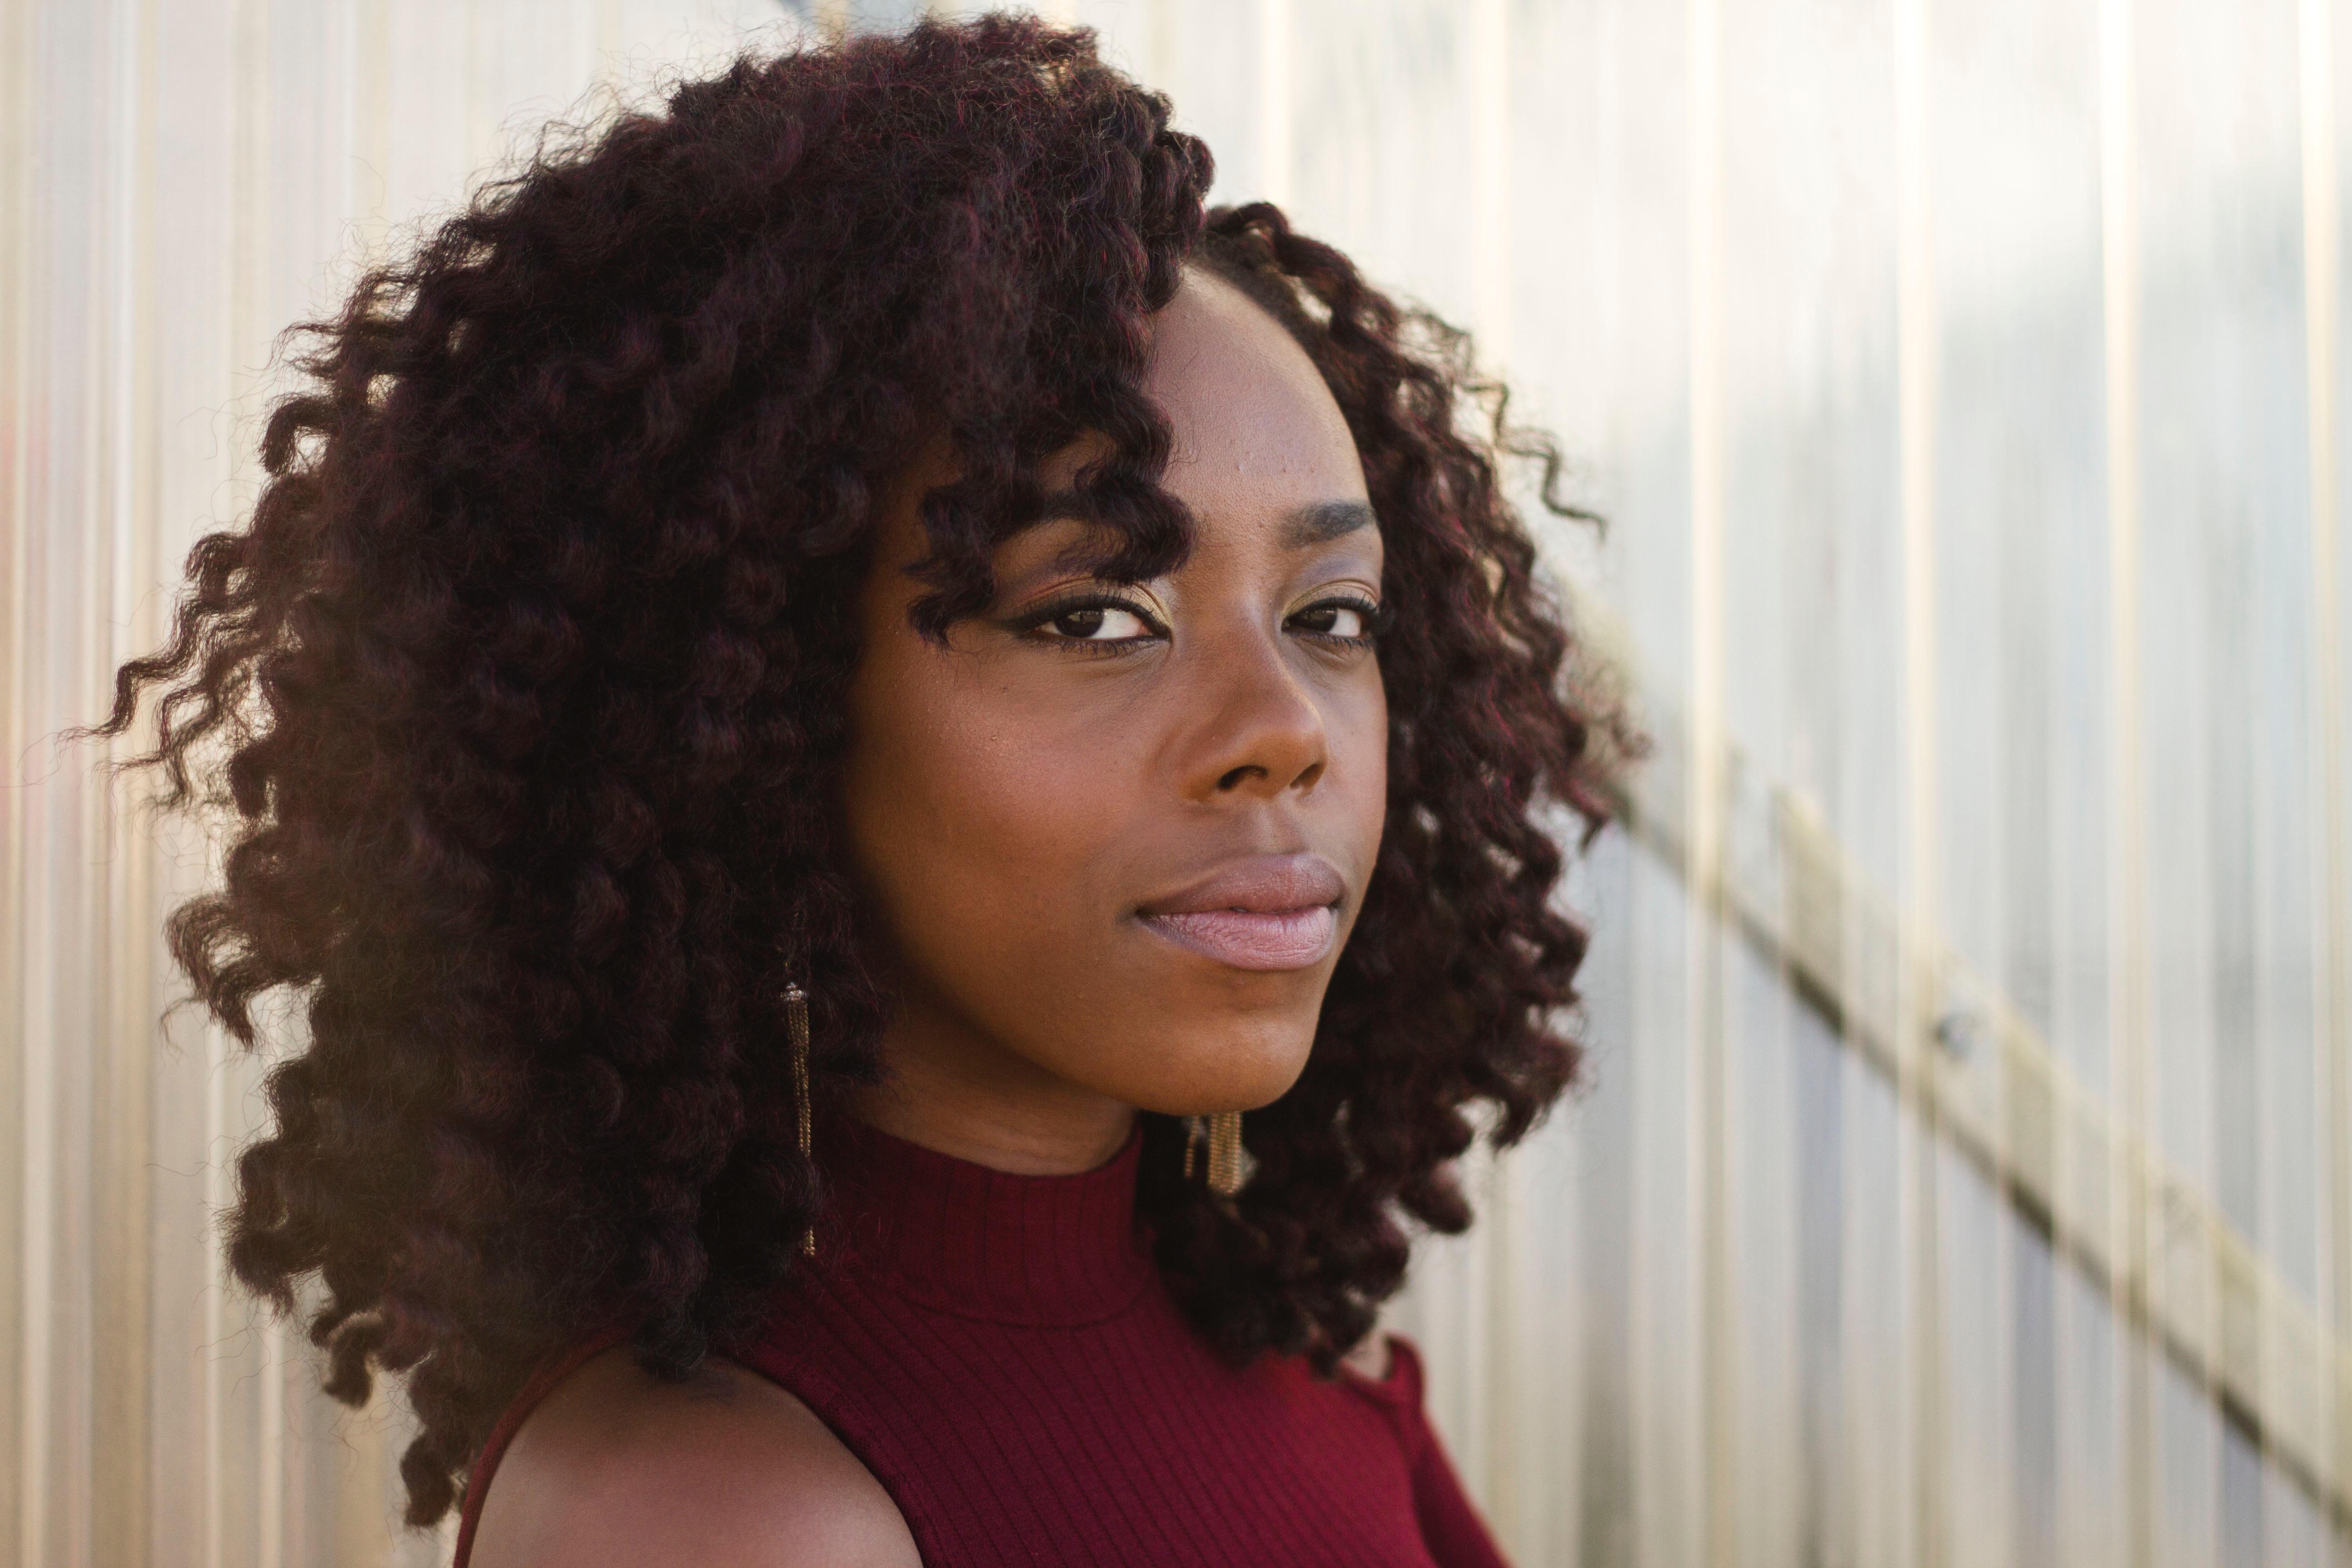 Black women develop confidence through self-compassion and value exploration.